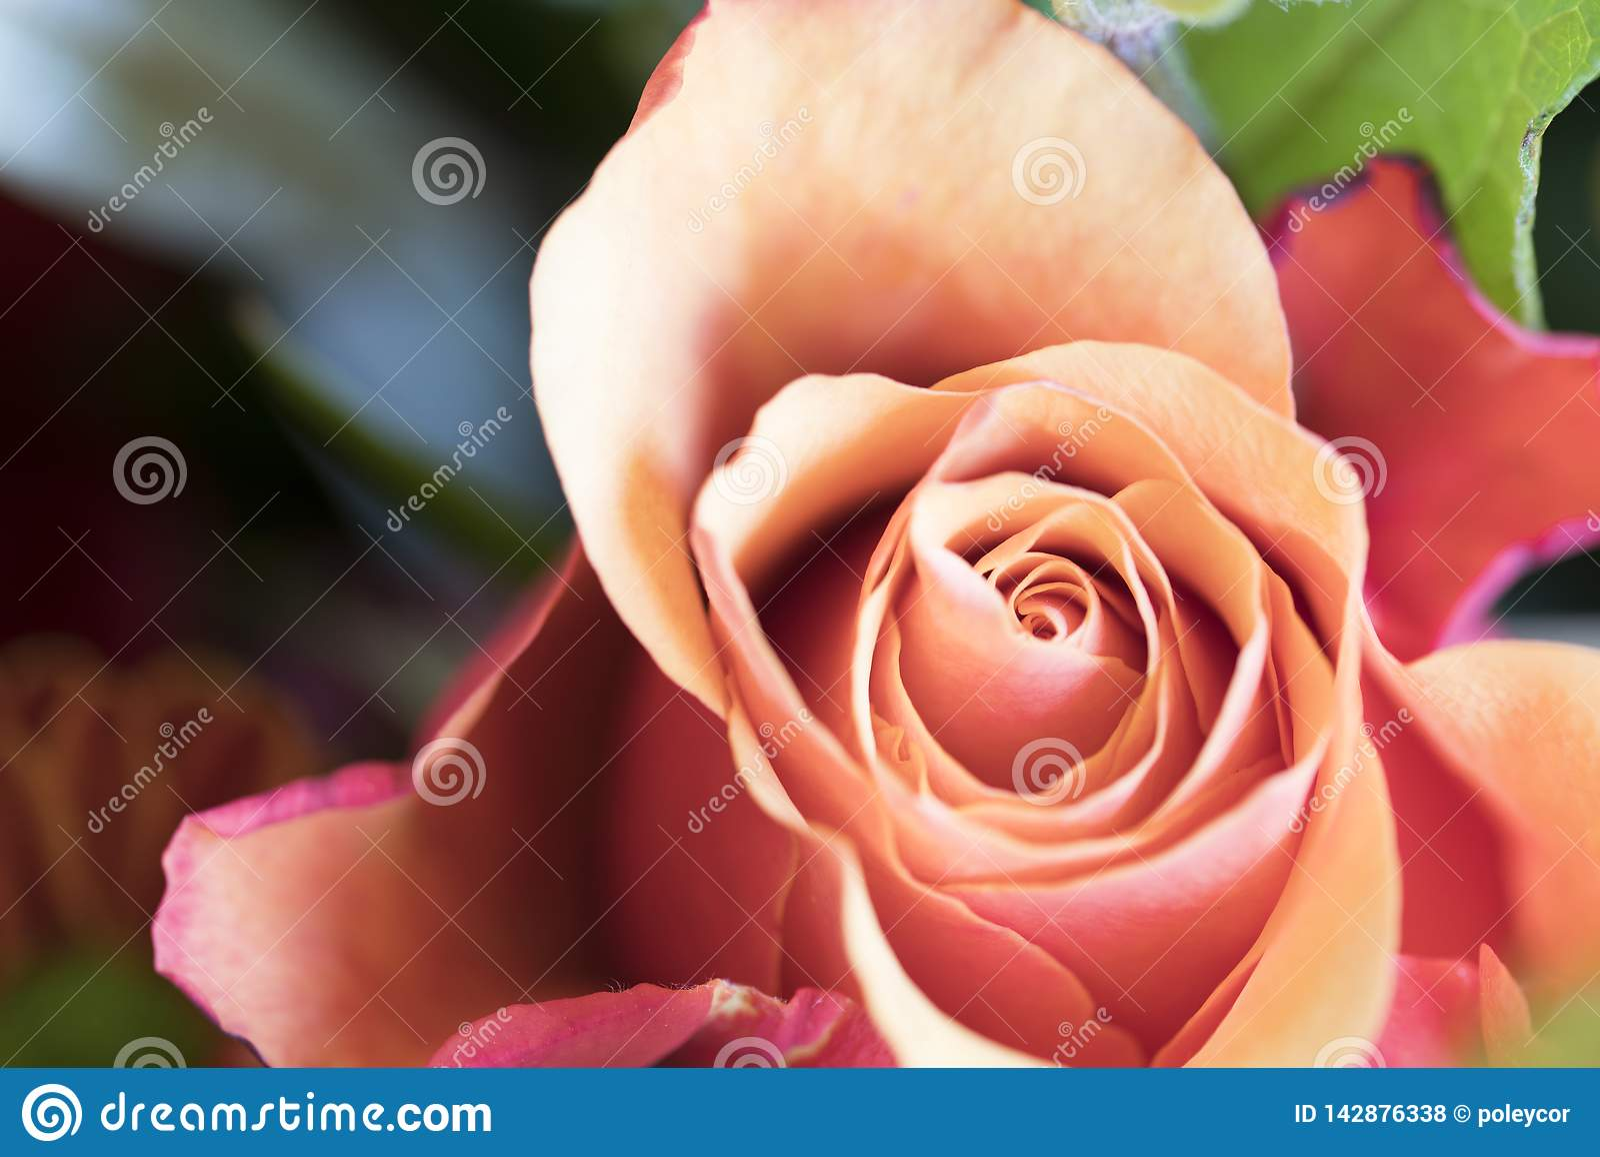 Close up red orange rose